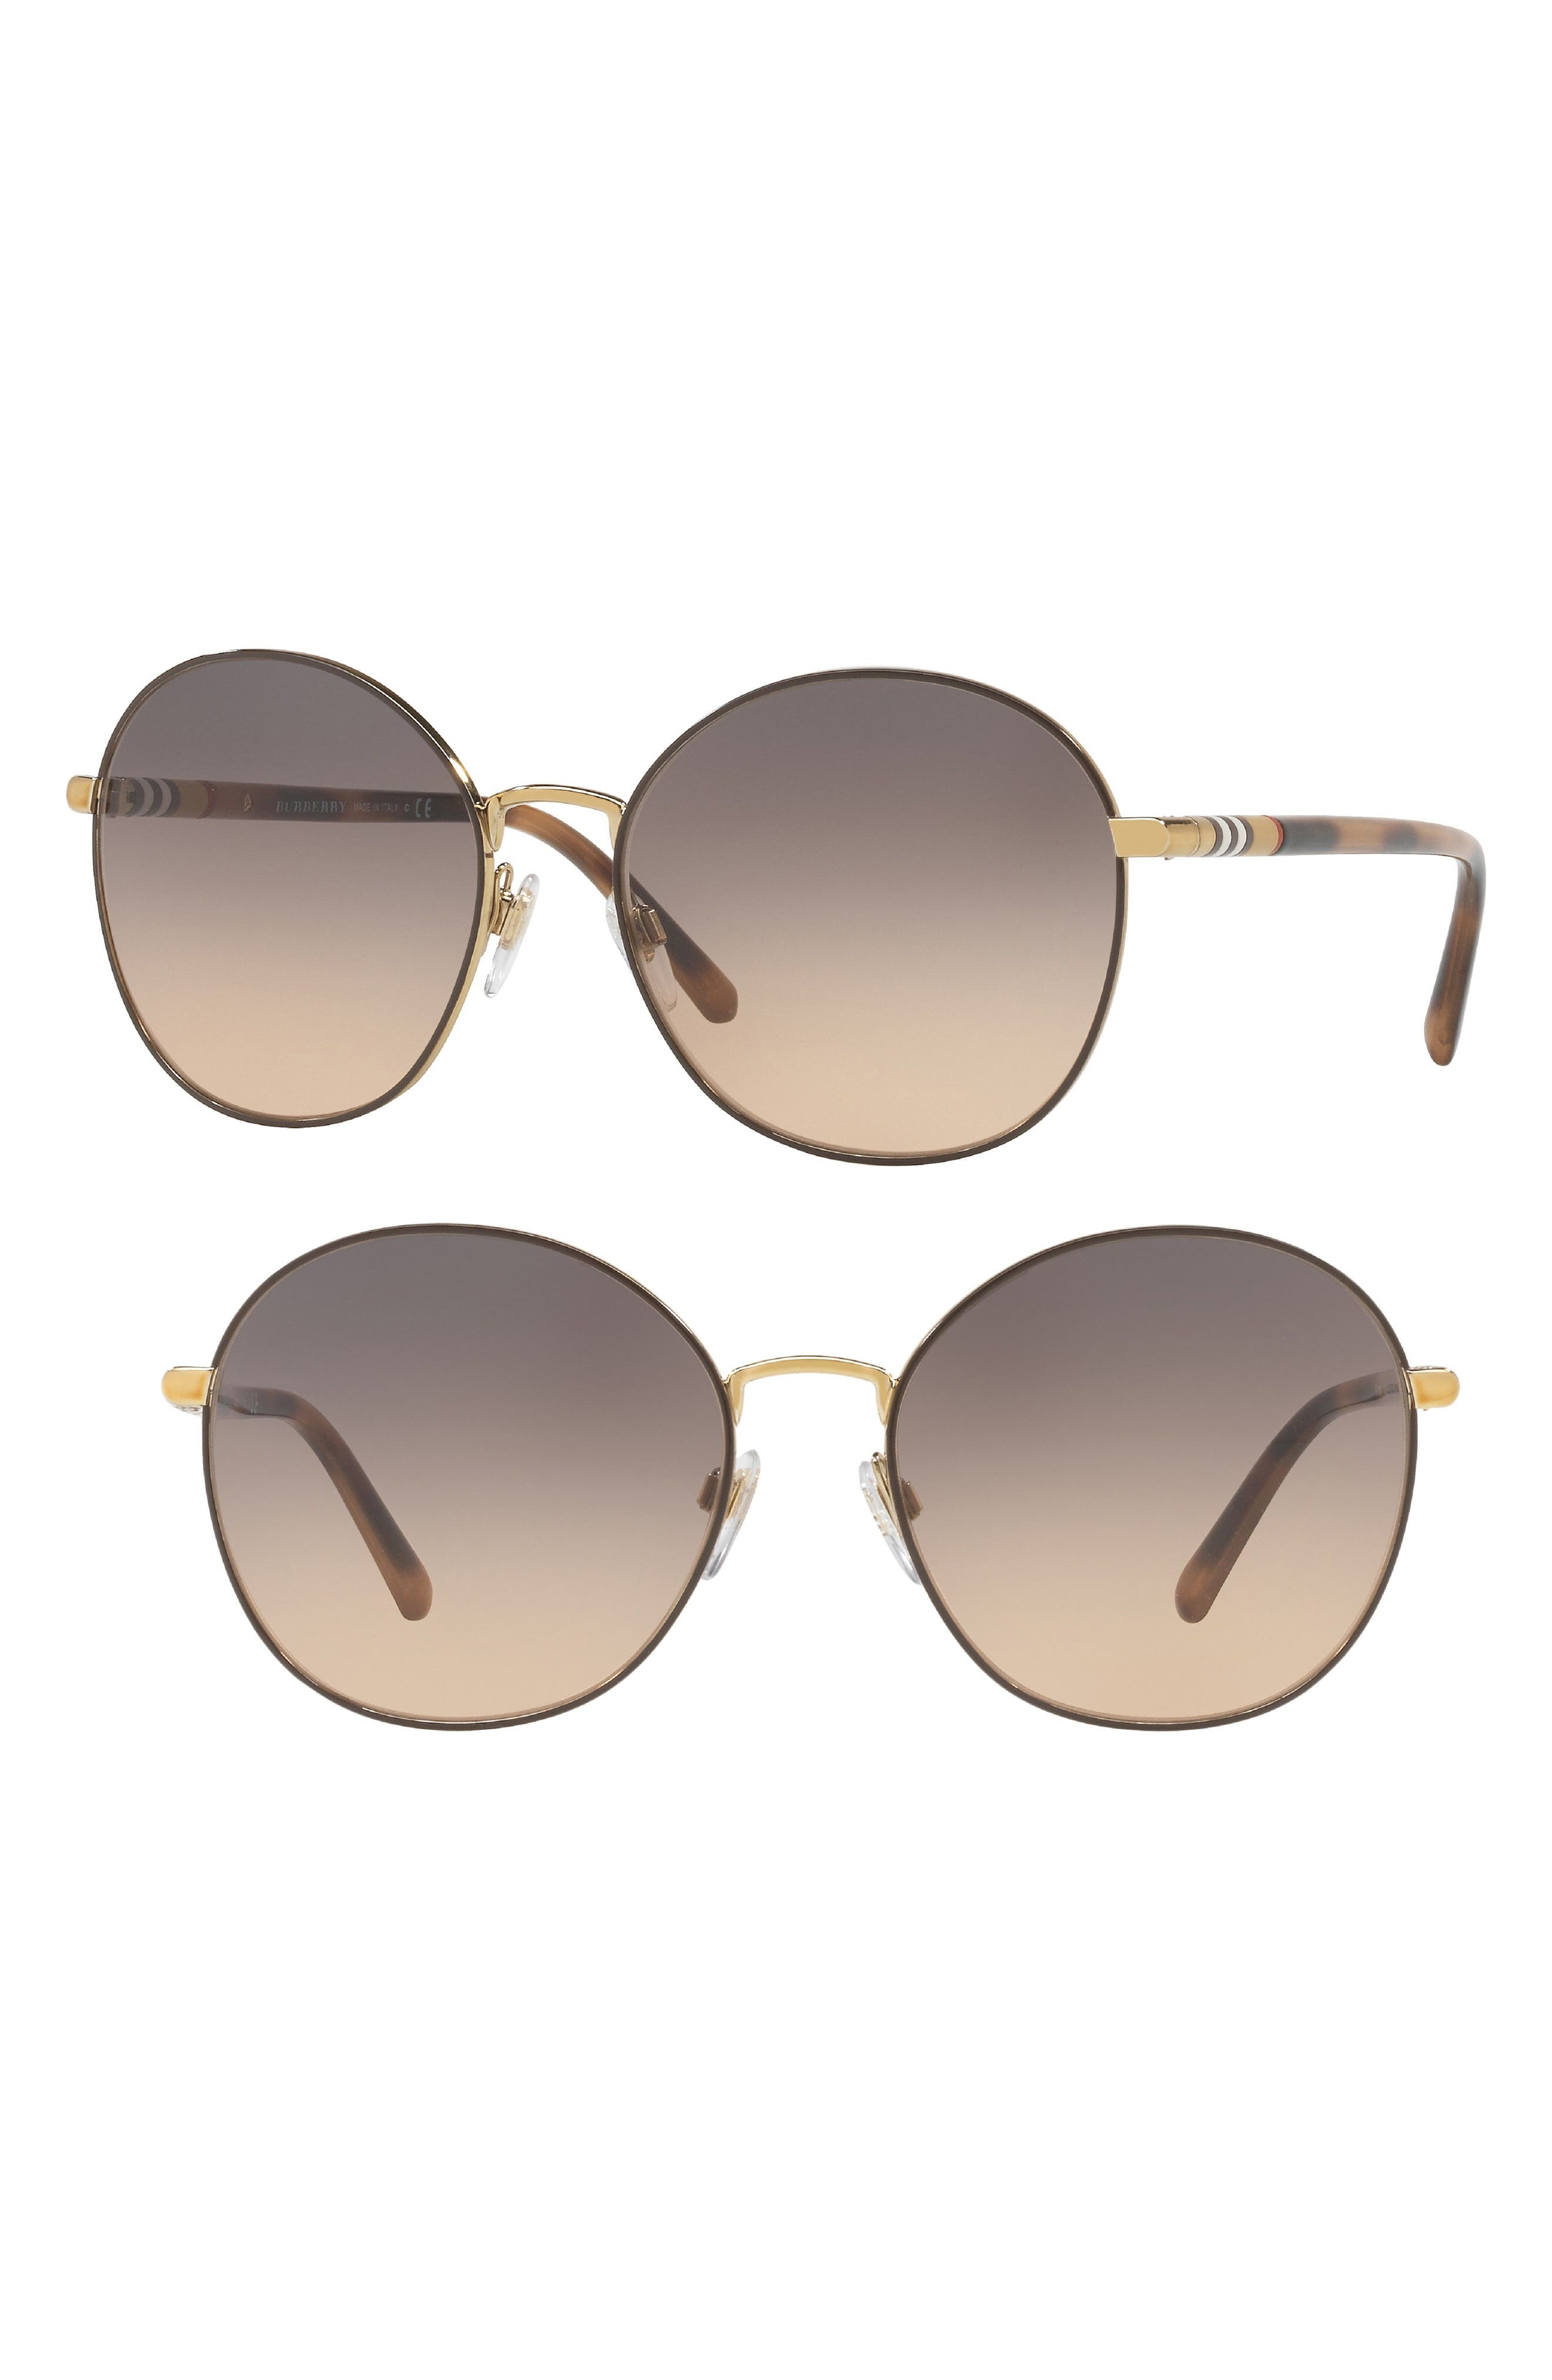 56mm Gradient Round Sunglasses,                         Main,                         color, PALE GOLD